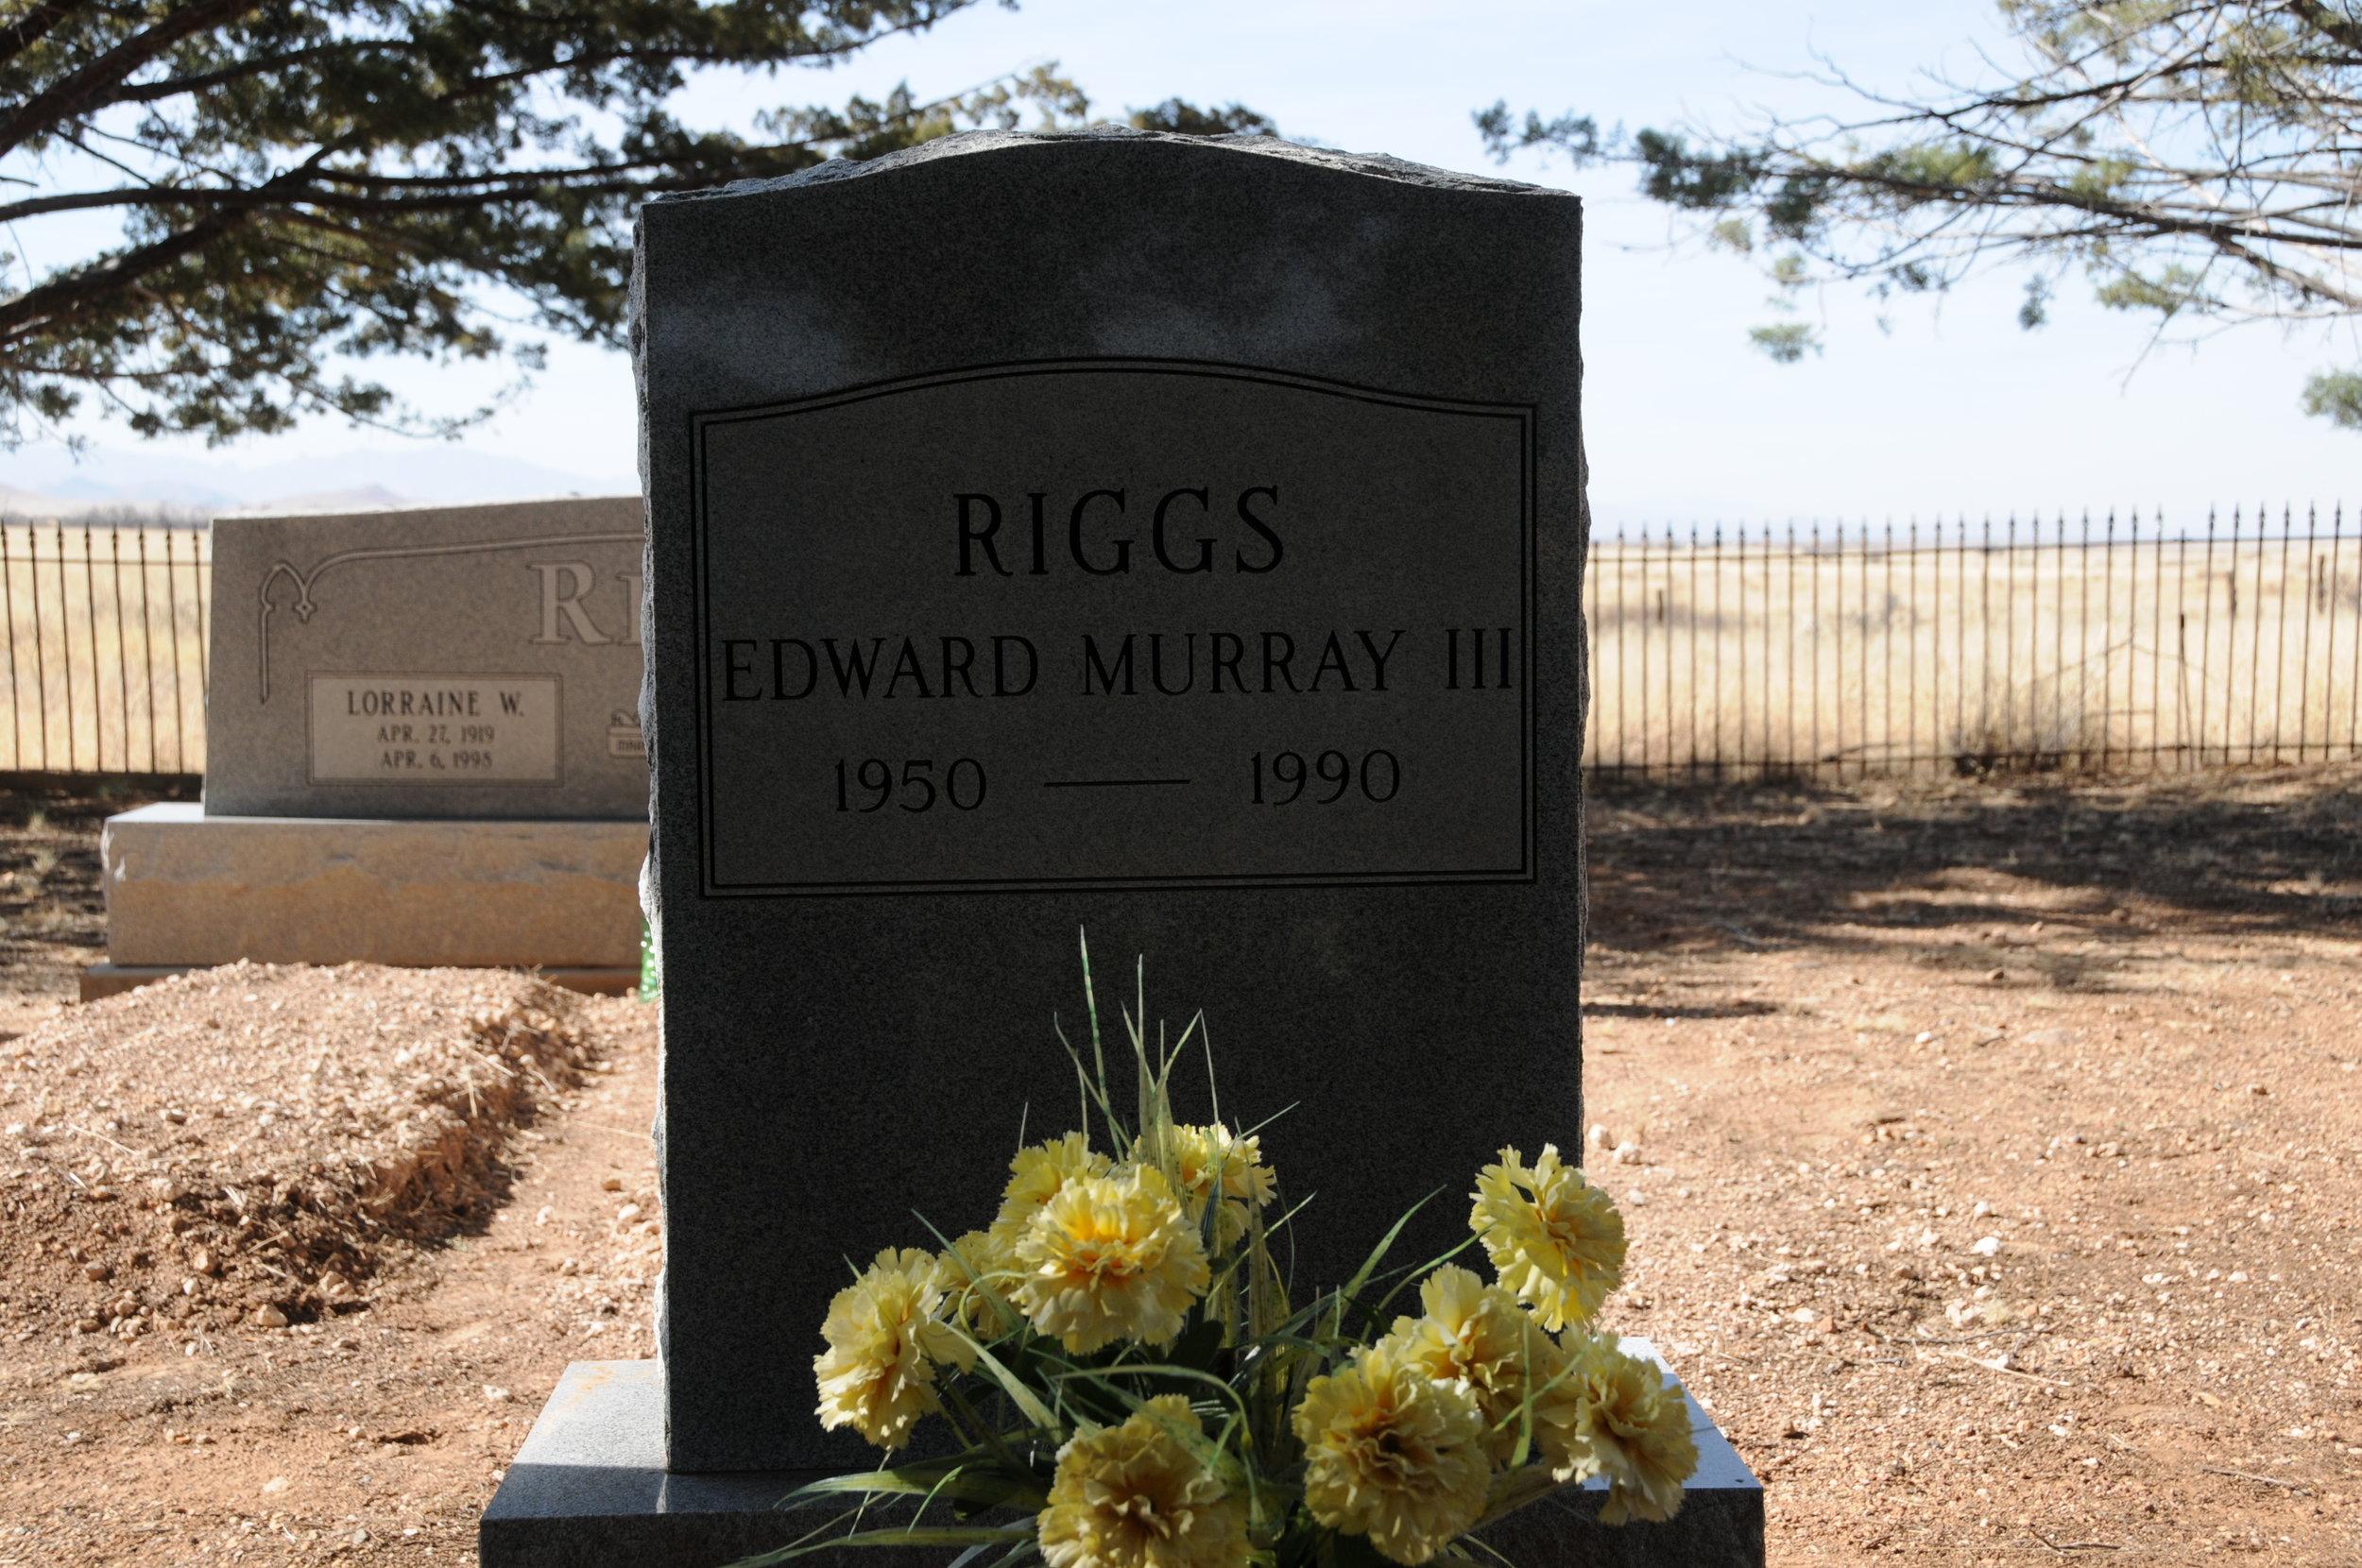 6a EDWARD MURRAY RIGGS III